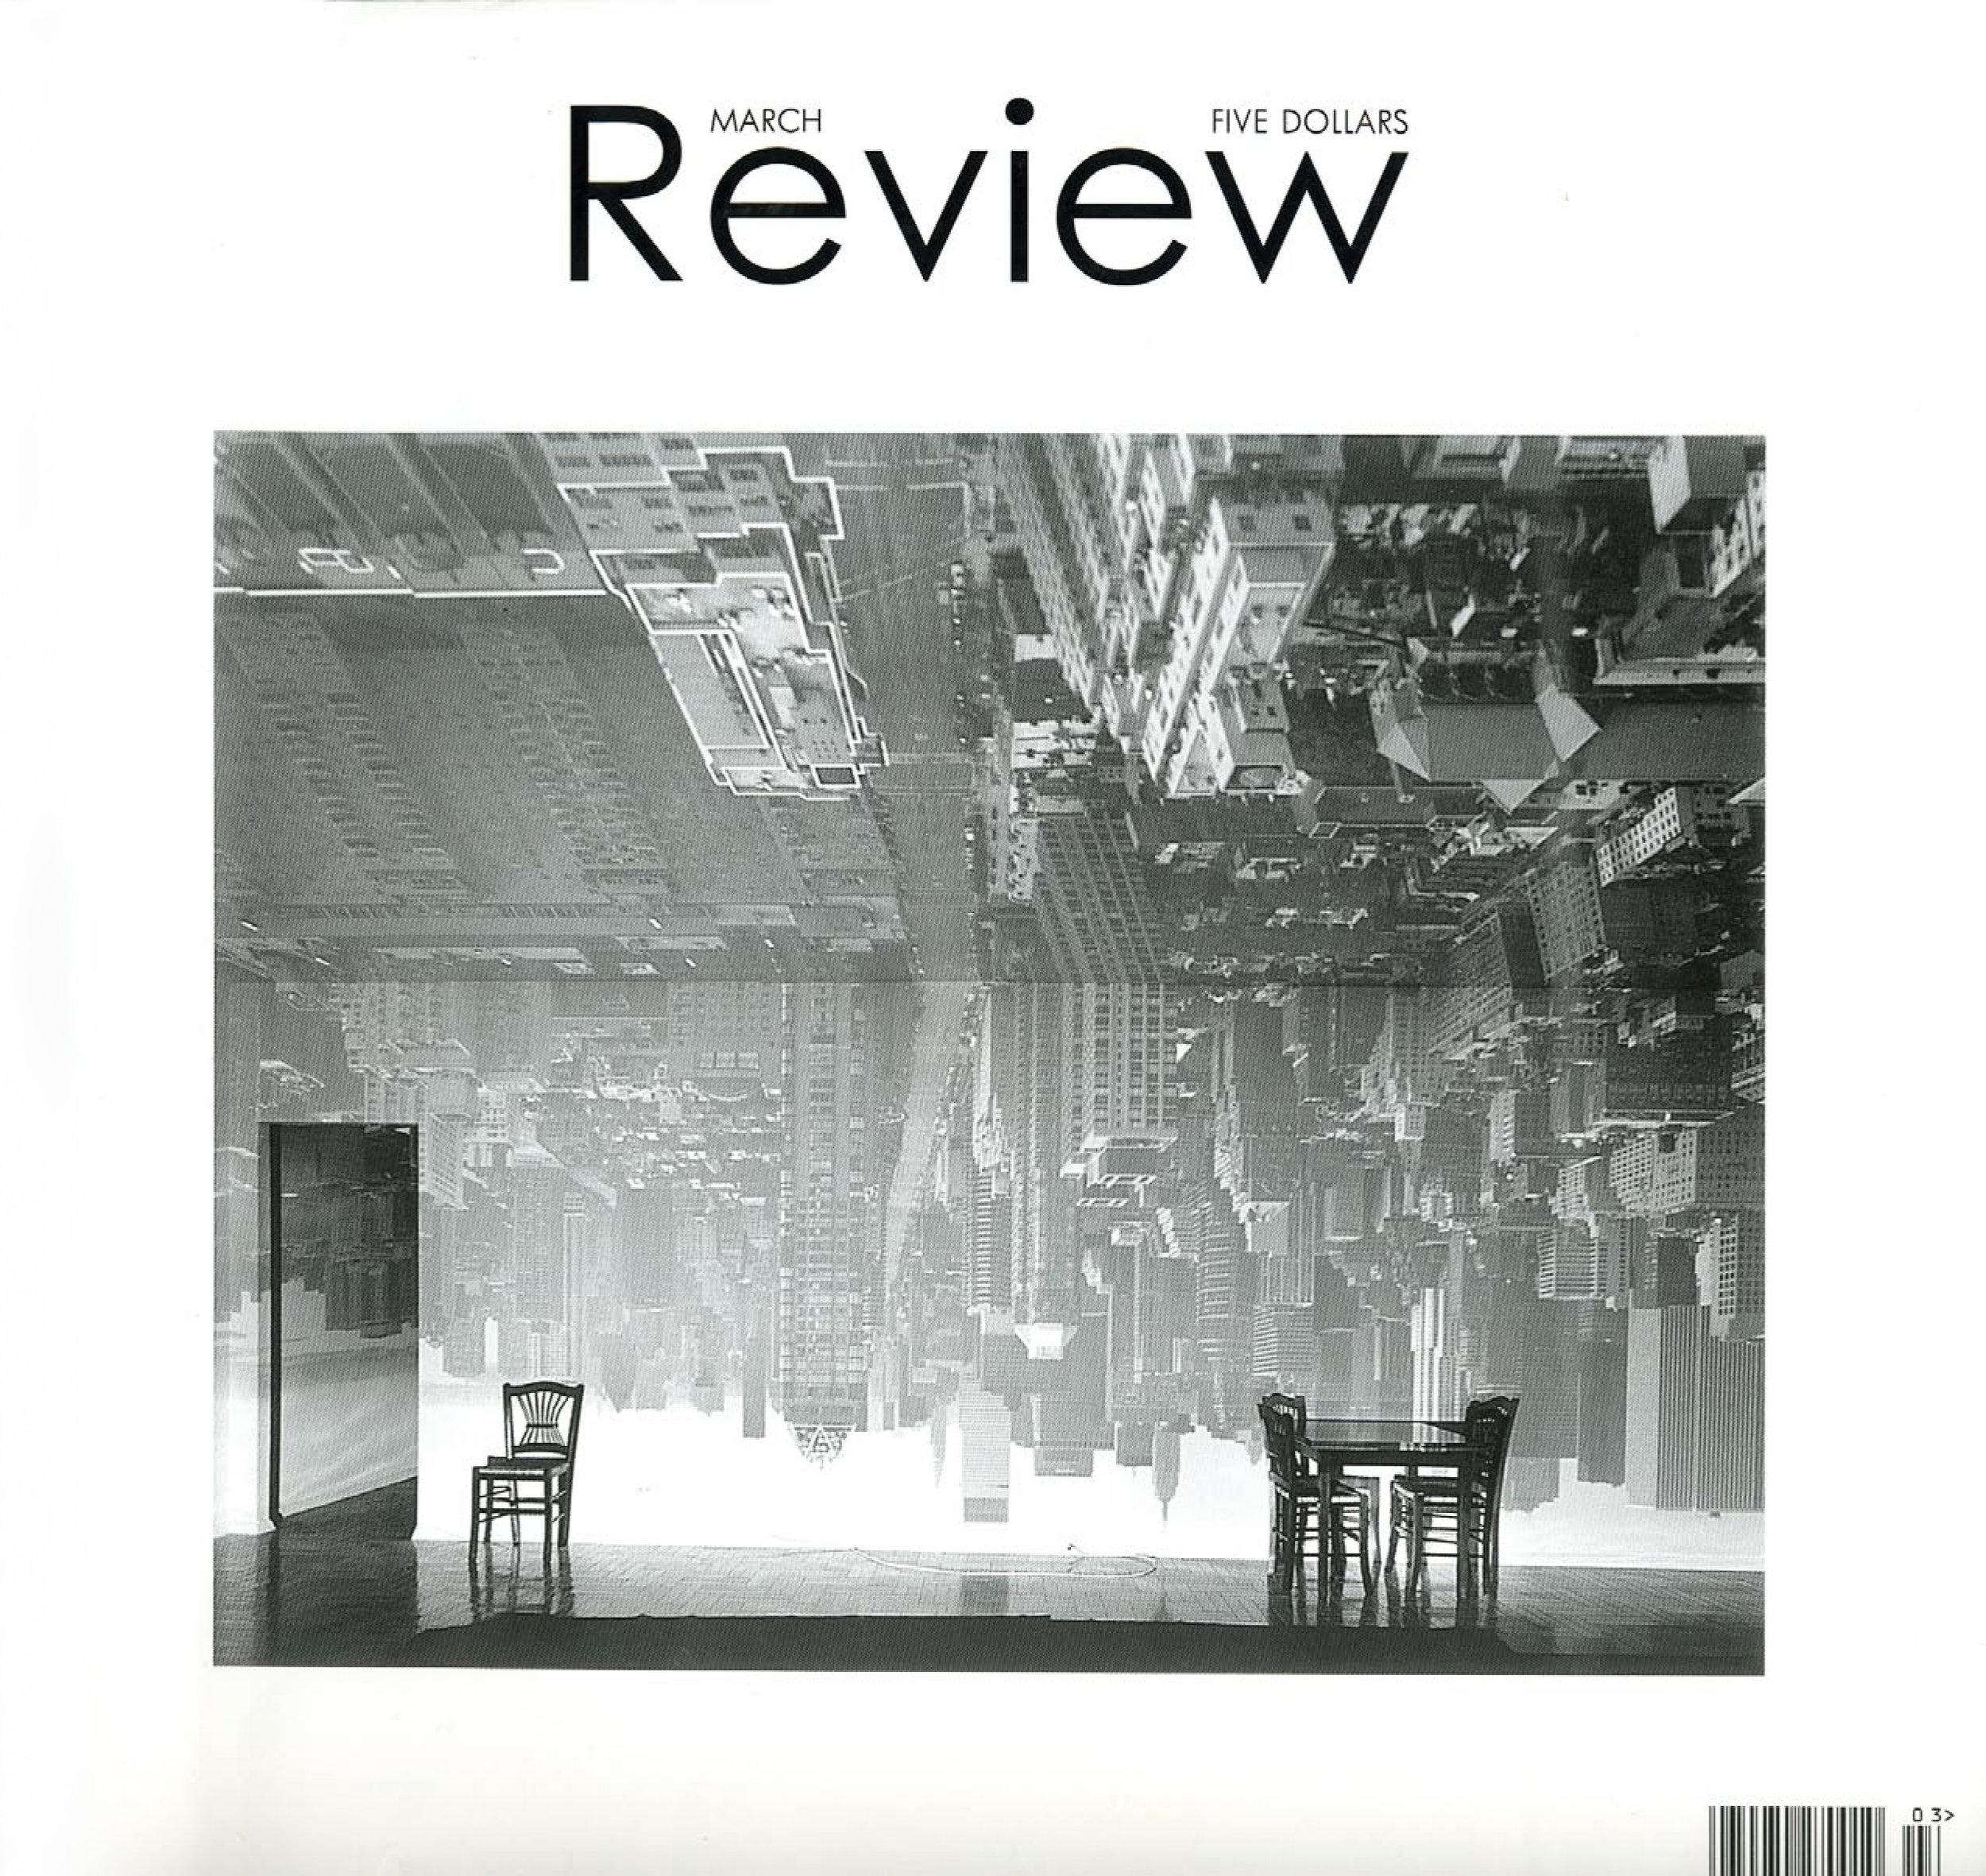 alvarez-review-1.jpg